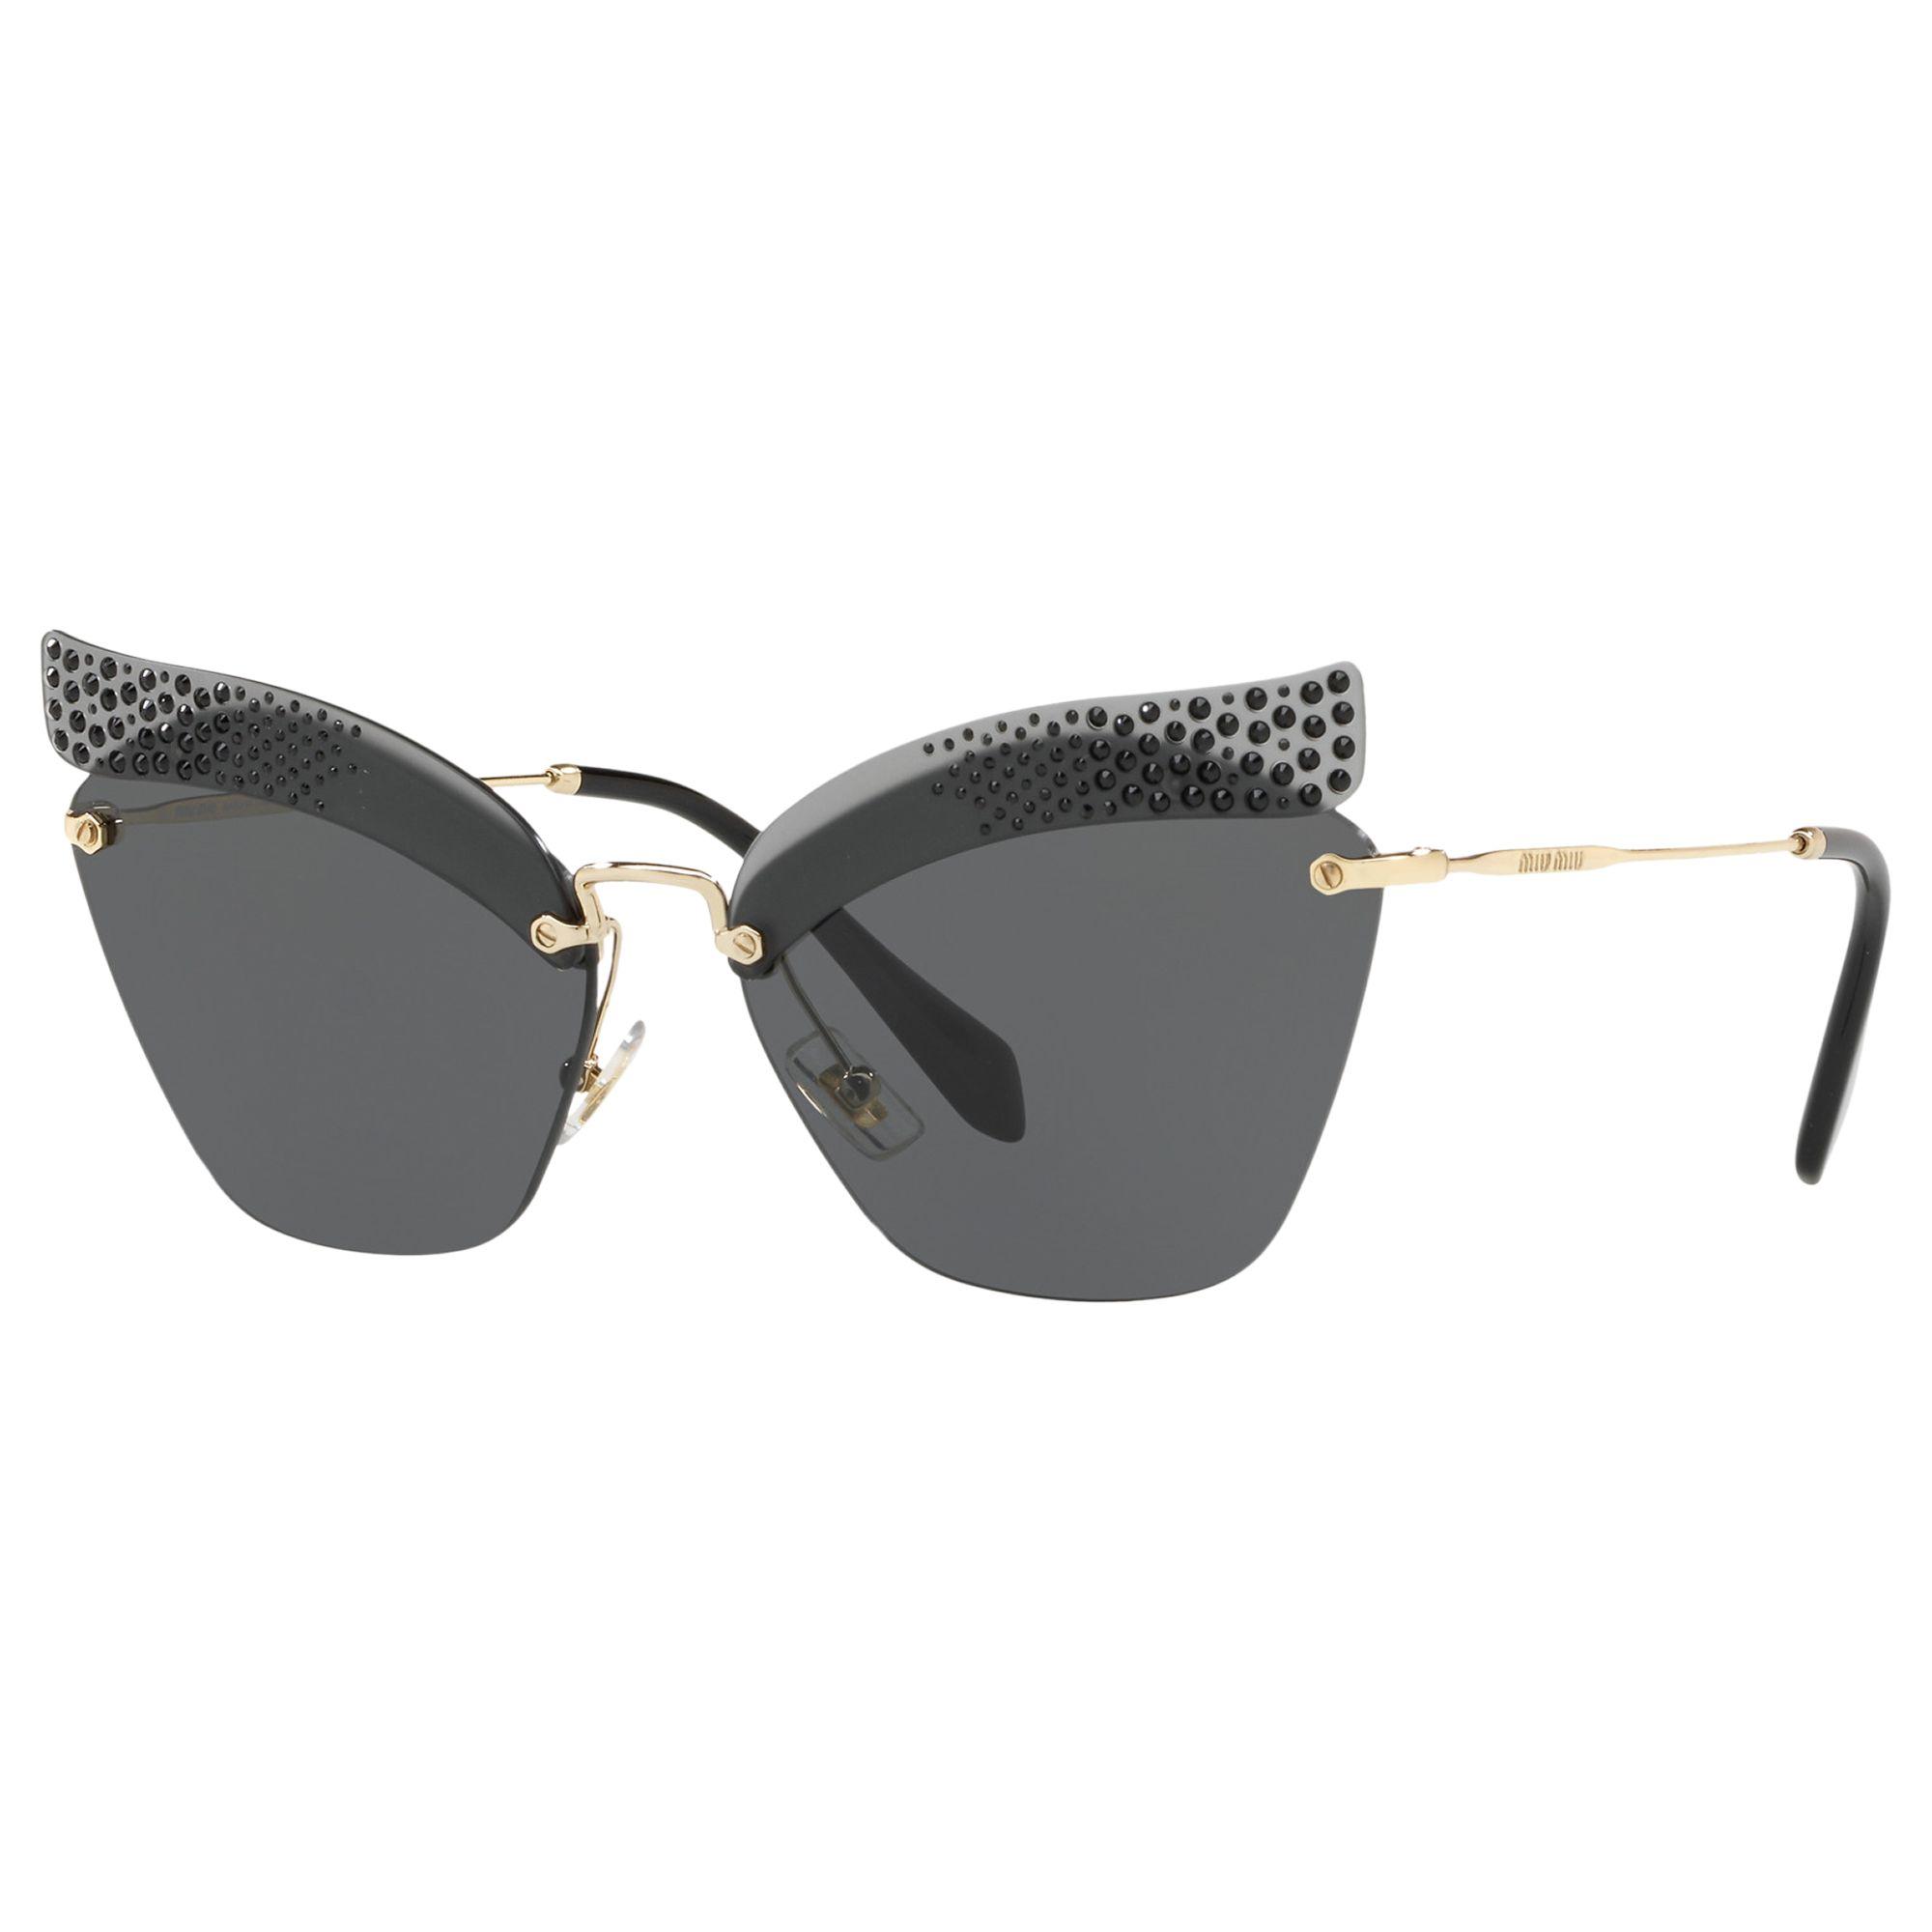 Miu Miu Miu Miu MU56TS Rimless Square Sunglasses, Grey/Grey